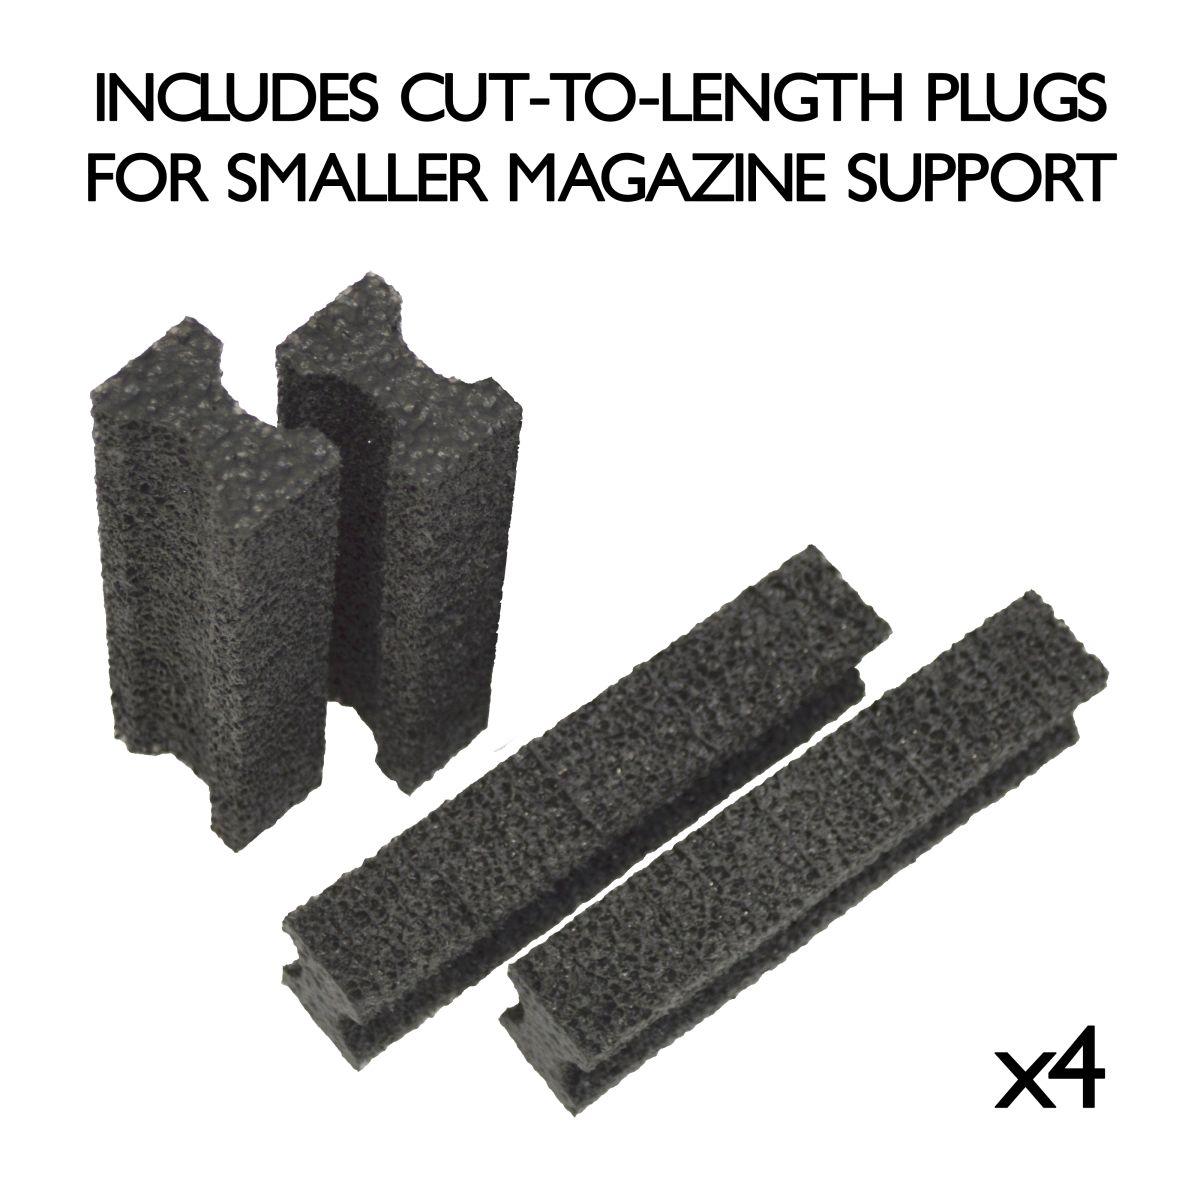 Cut-to-length plugs